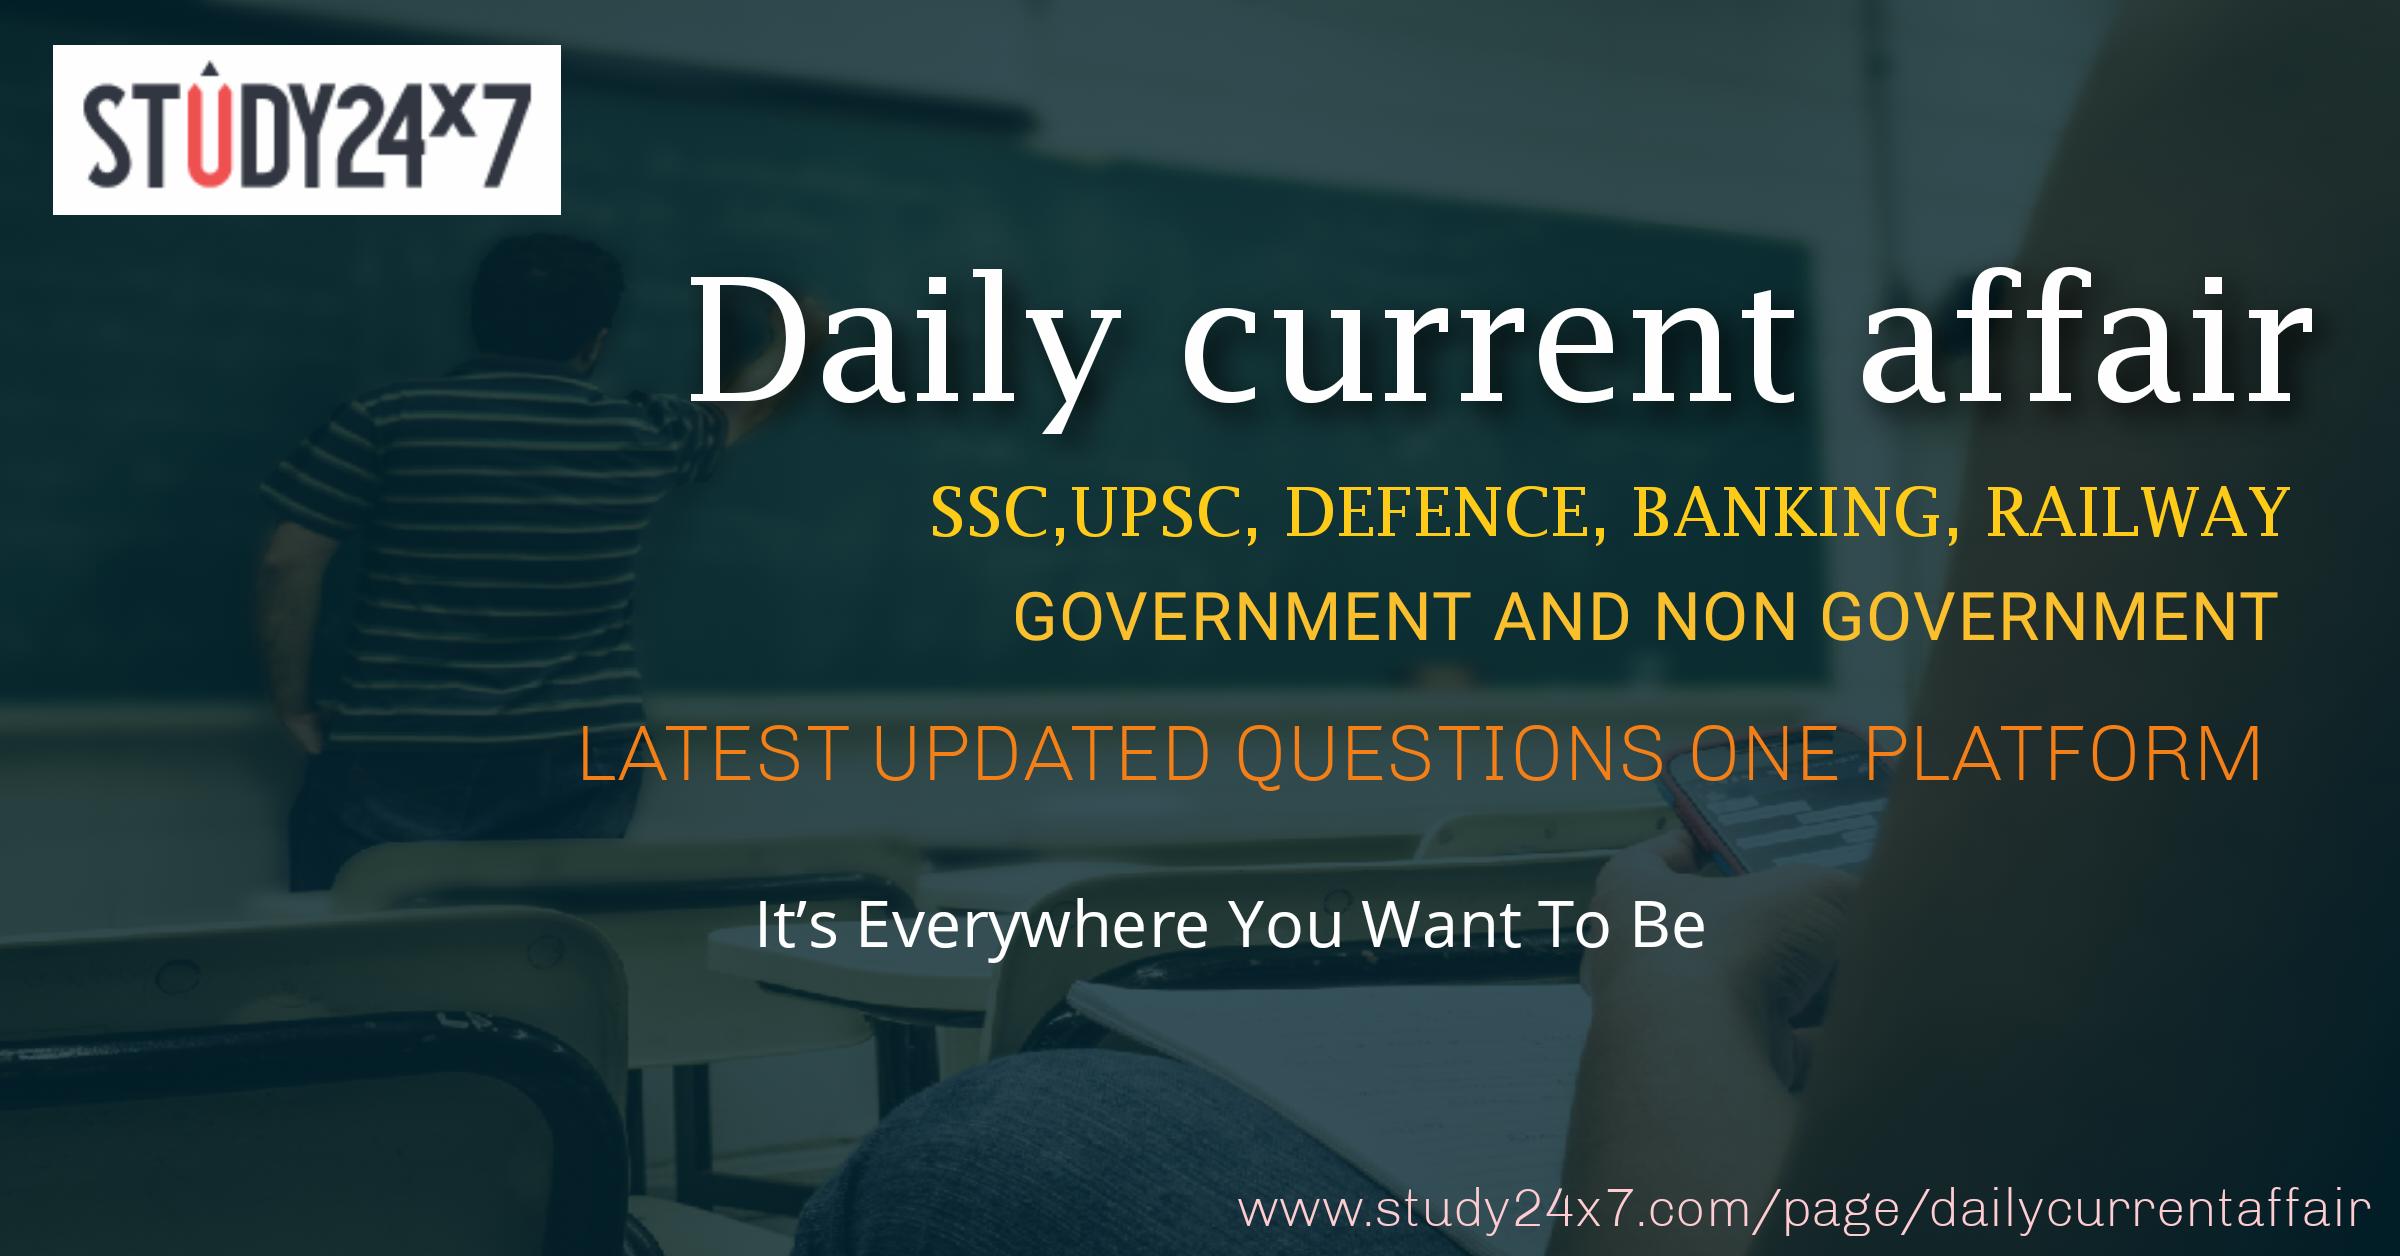 https://www.study24x7.com/article/977/current-affairs...